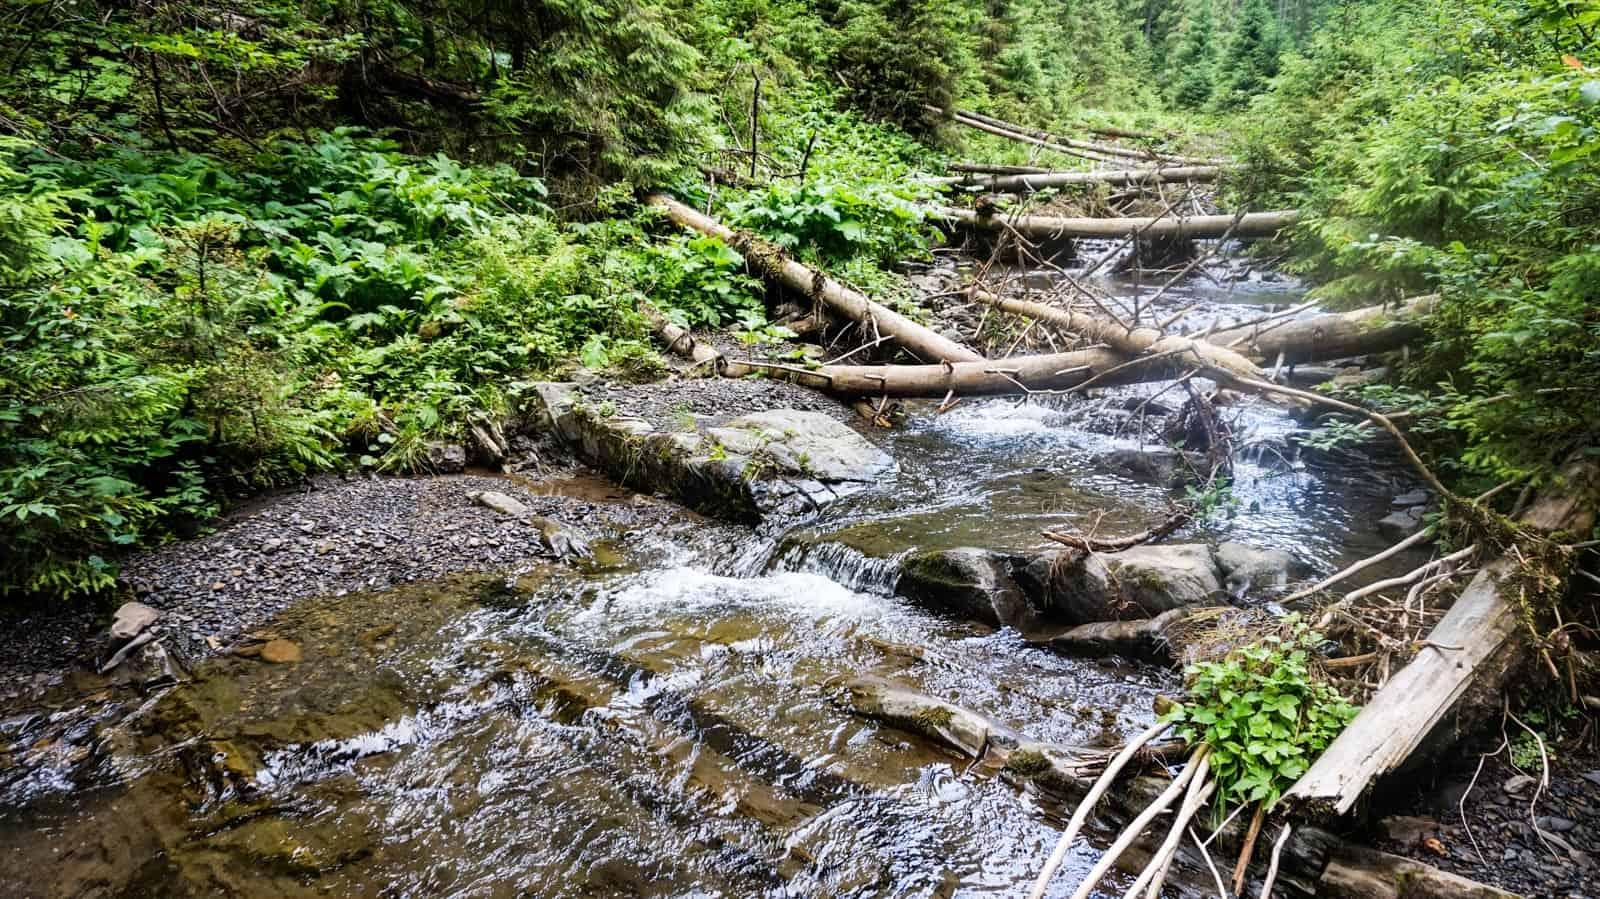 Synevyr National Park 0921.JPG - European Wilderness Society - CC NonCommercial-NoDerivates 4.0 International